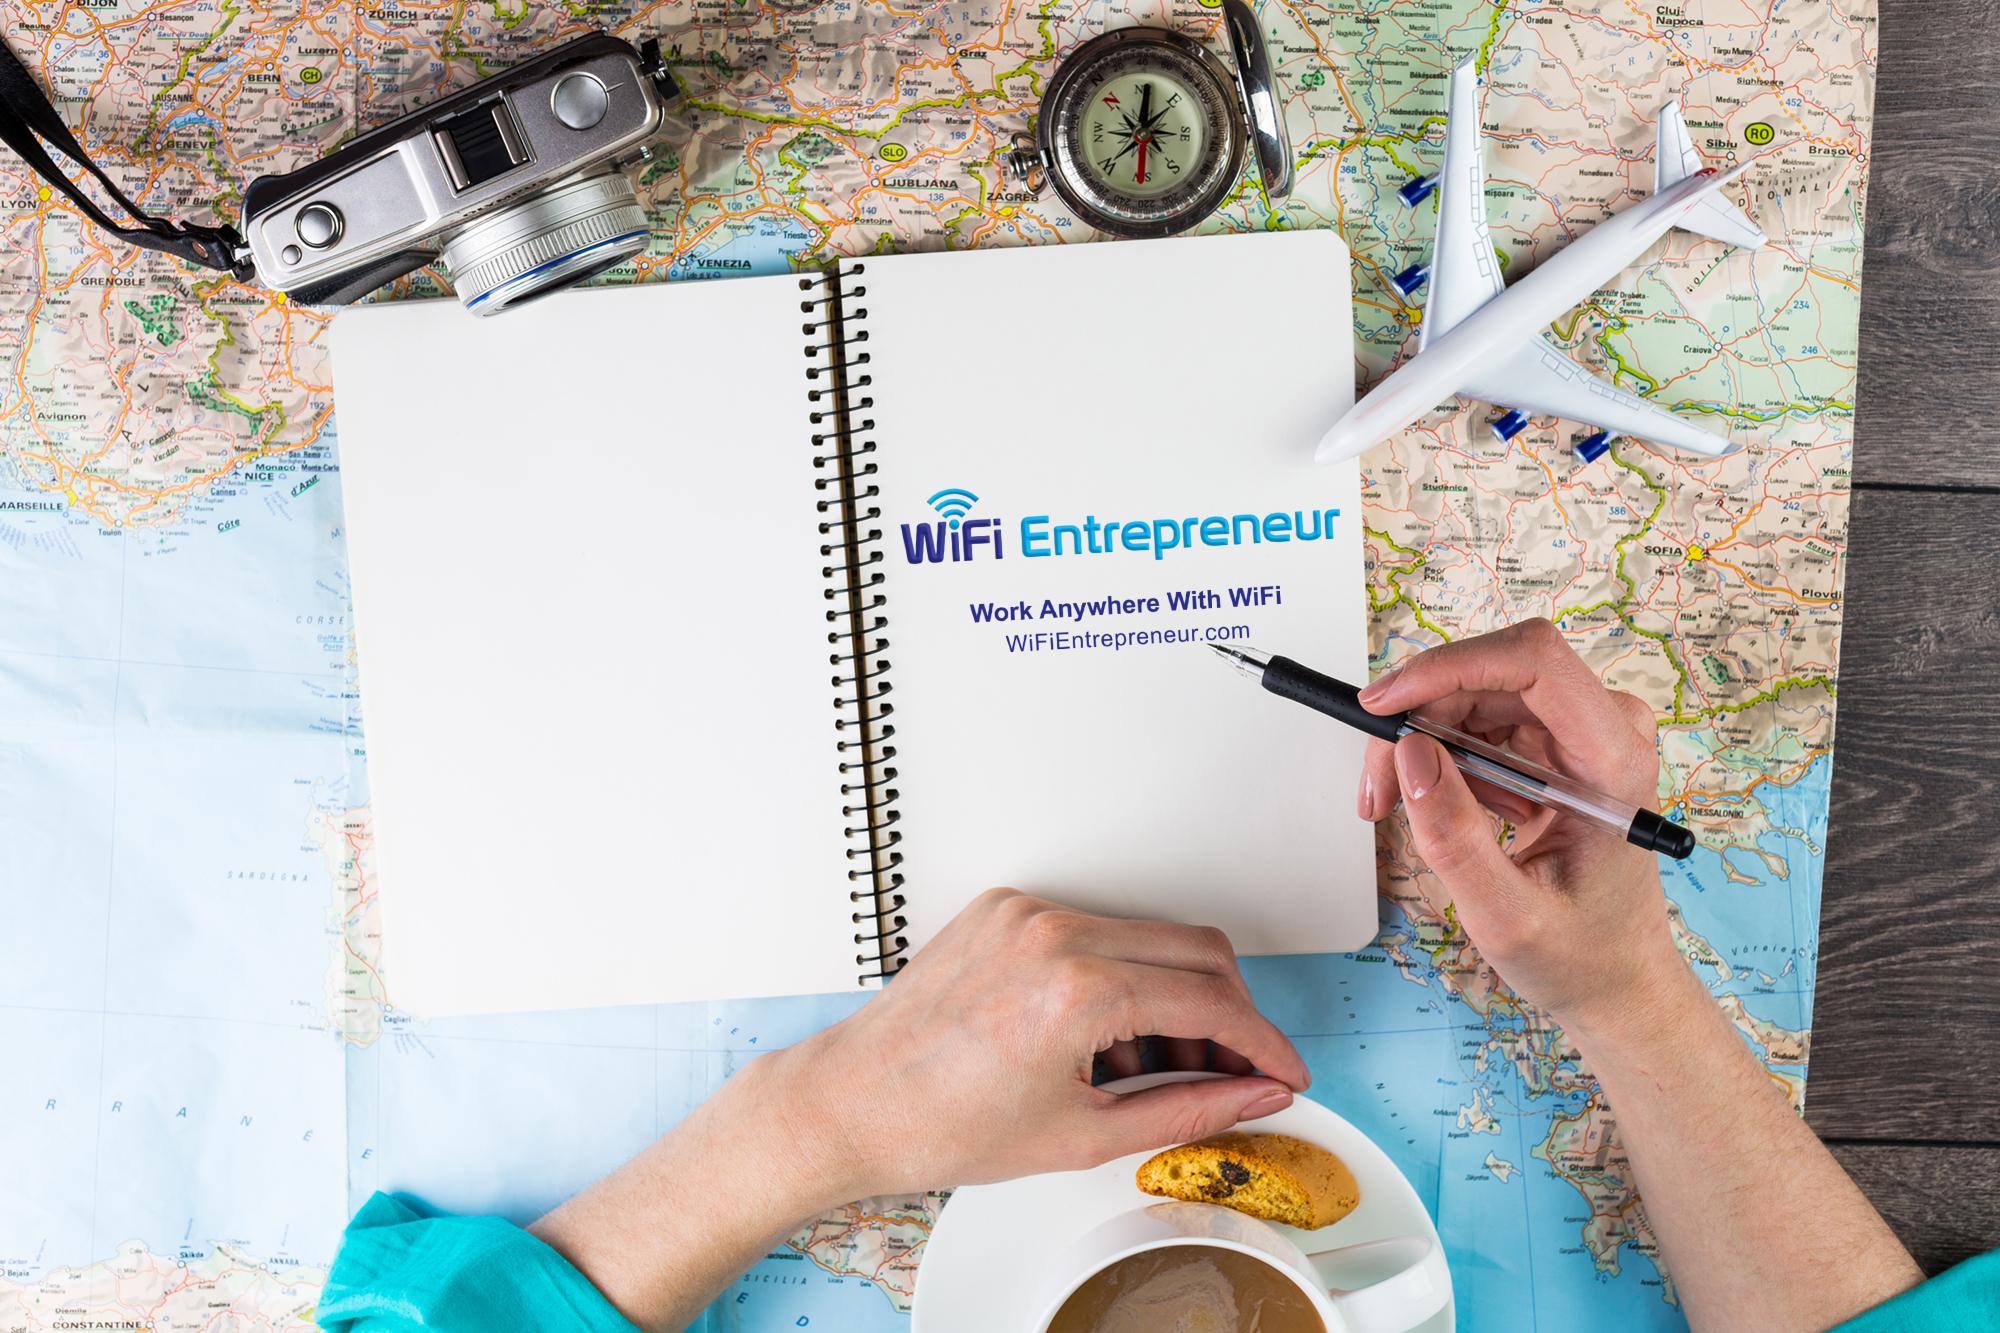 WiFi Entrepreneur Affiliate Marketing Guide 2